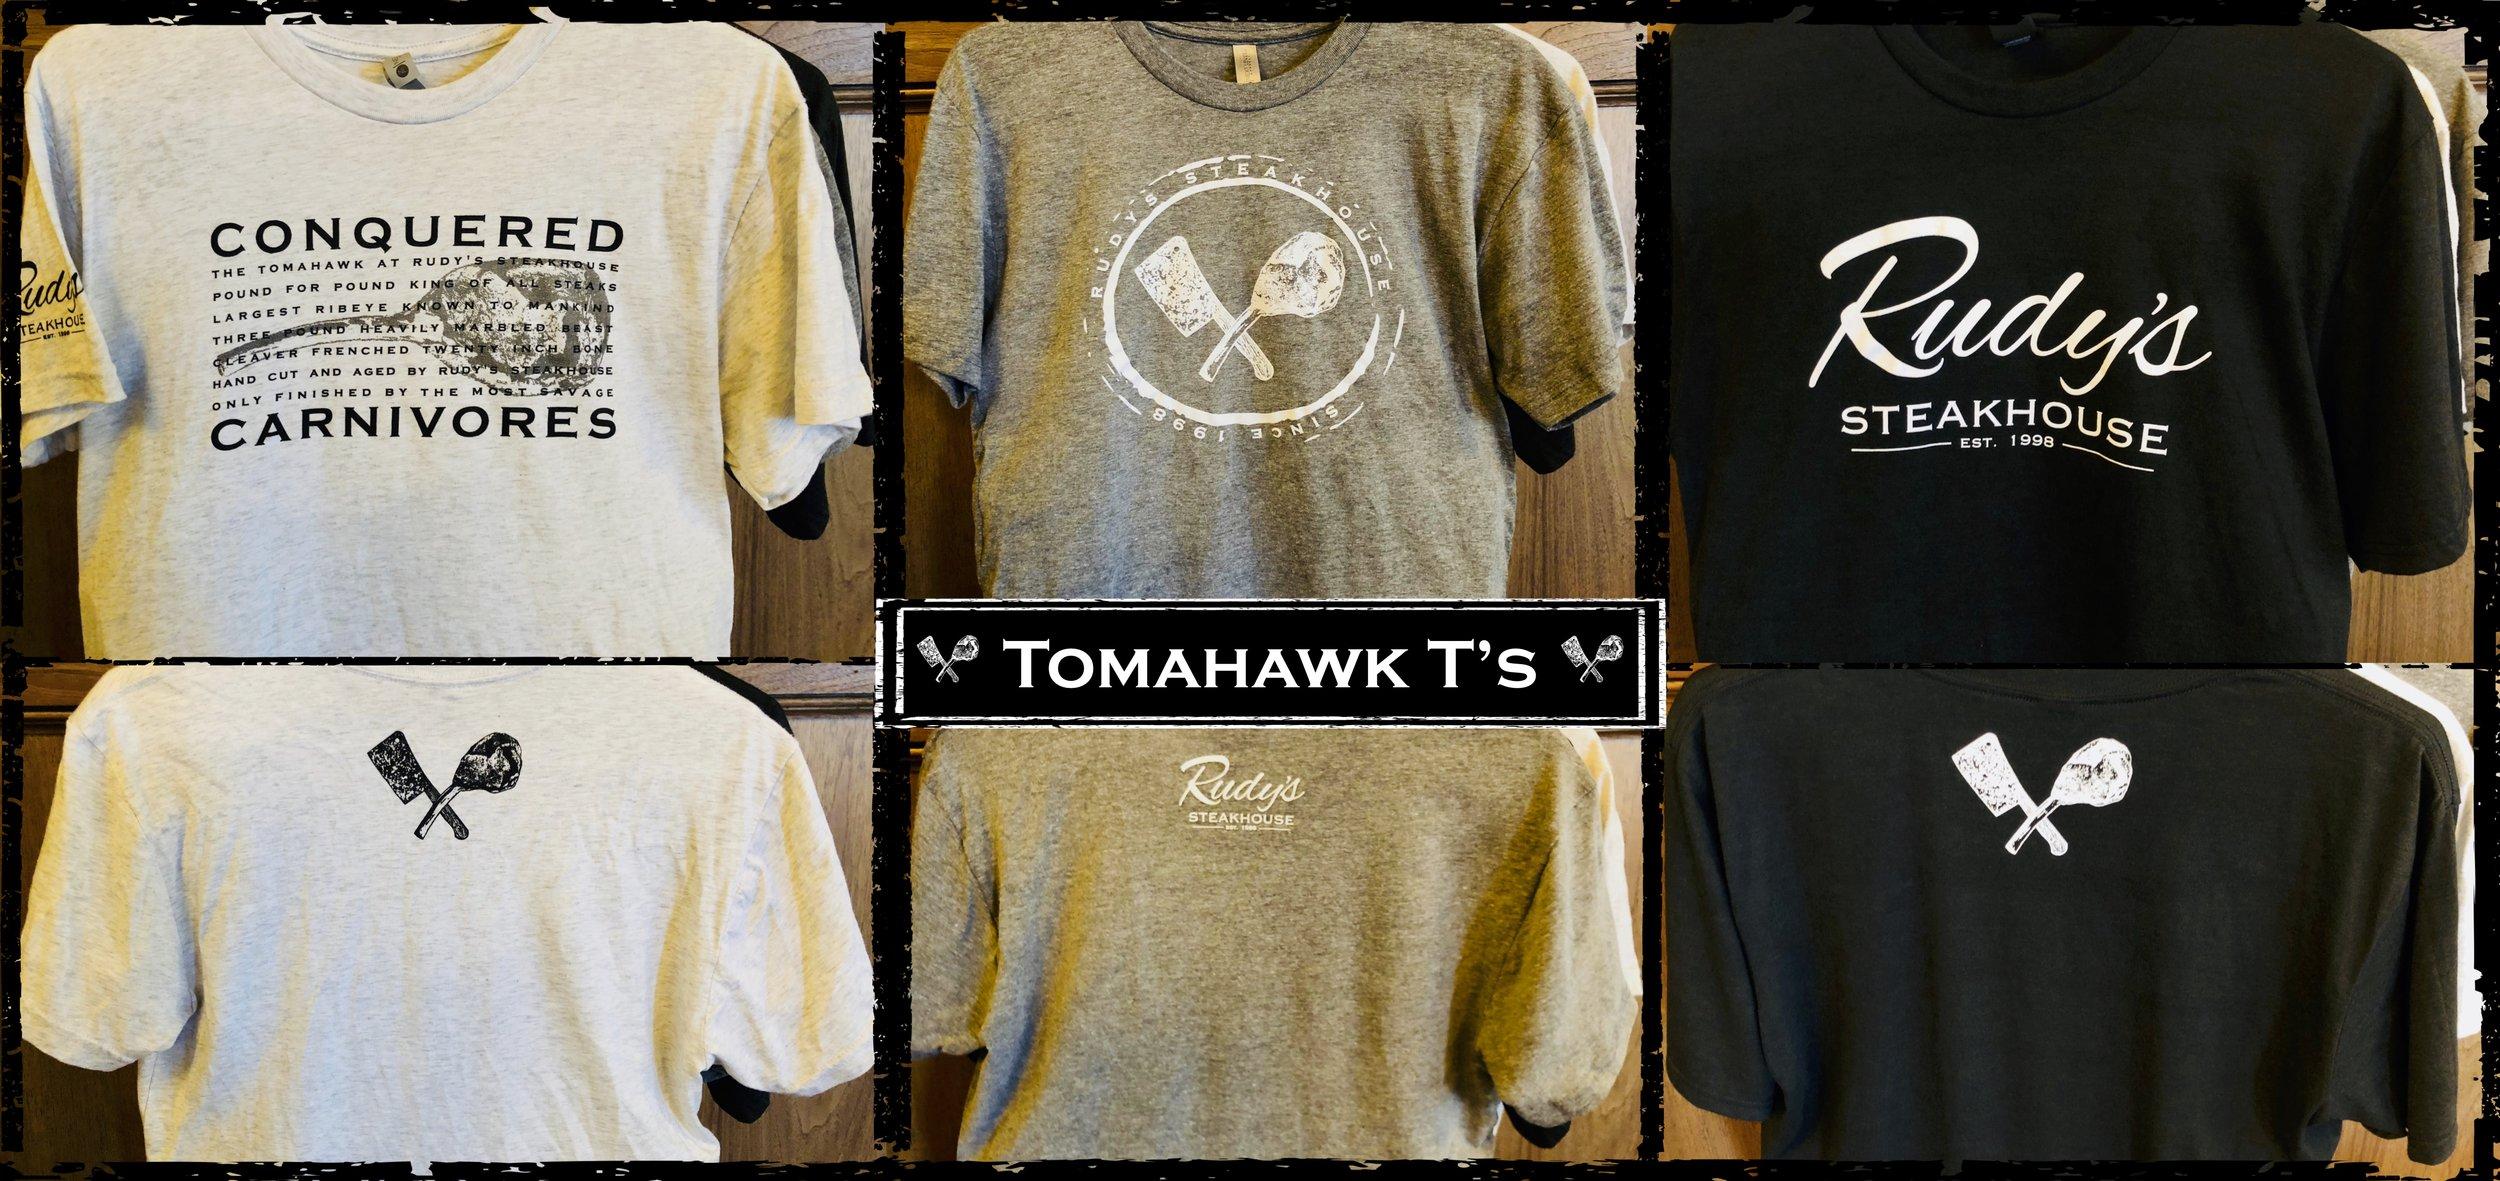 Rudy's Steakhouse Tomahawk Shirts.jpg